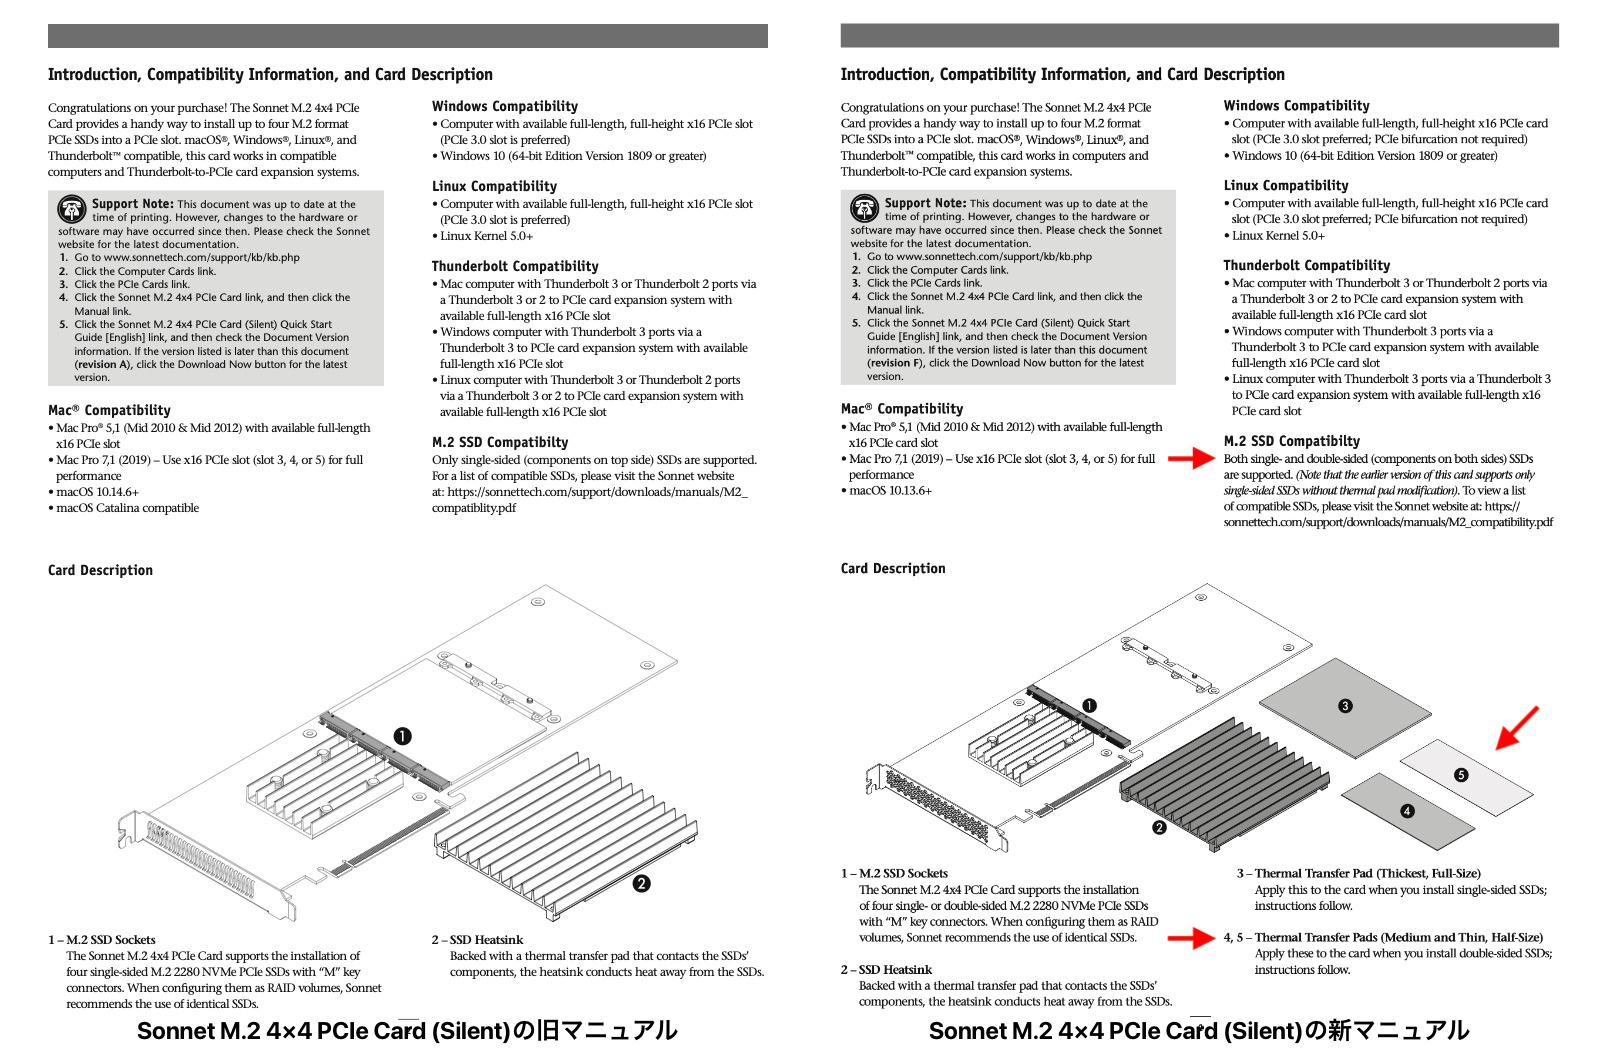 Sonnet M.2 4×4 PCIe Card (Silent)のマニュアル